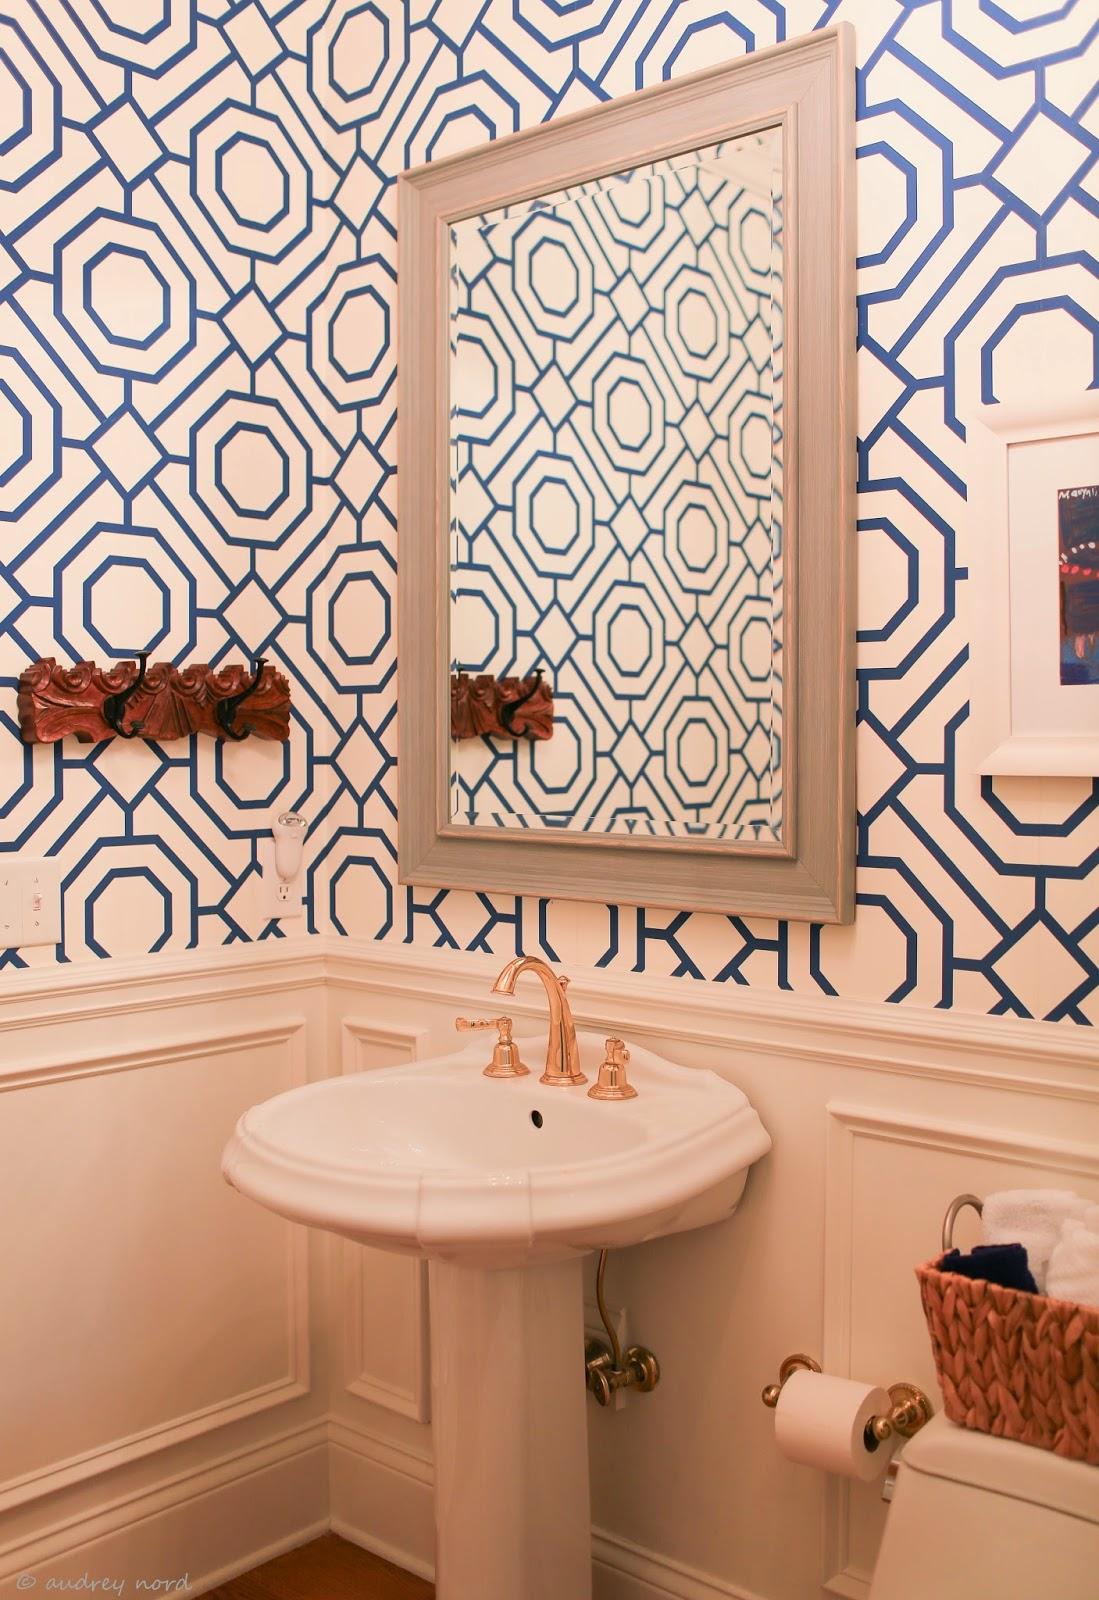 The Green Room Interiors Chattanooga TN Interior Decorator - Bathroom remodeling chattanooga tn